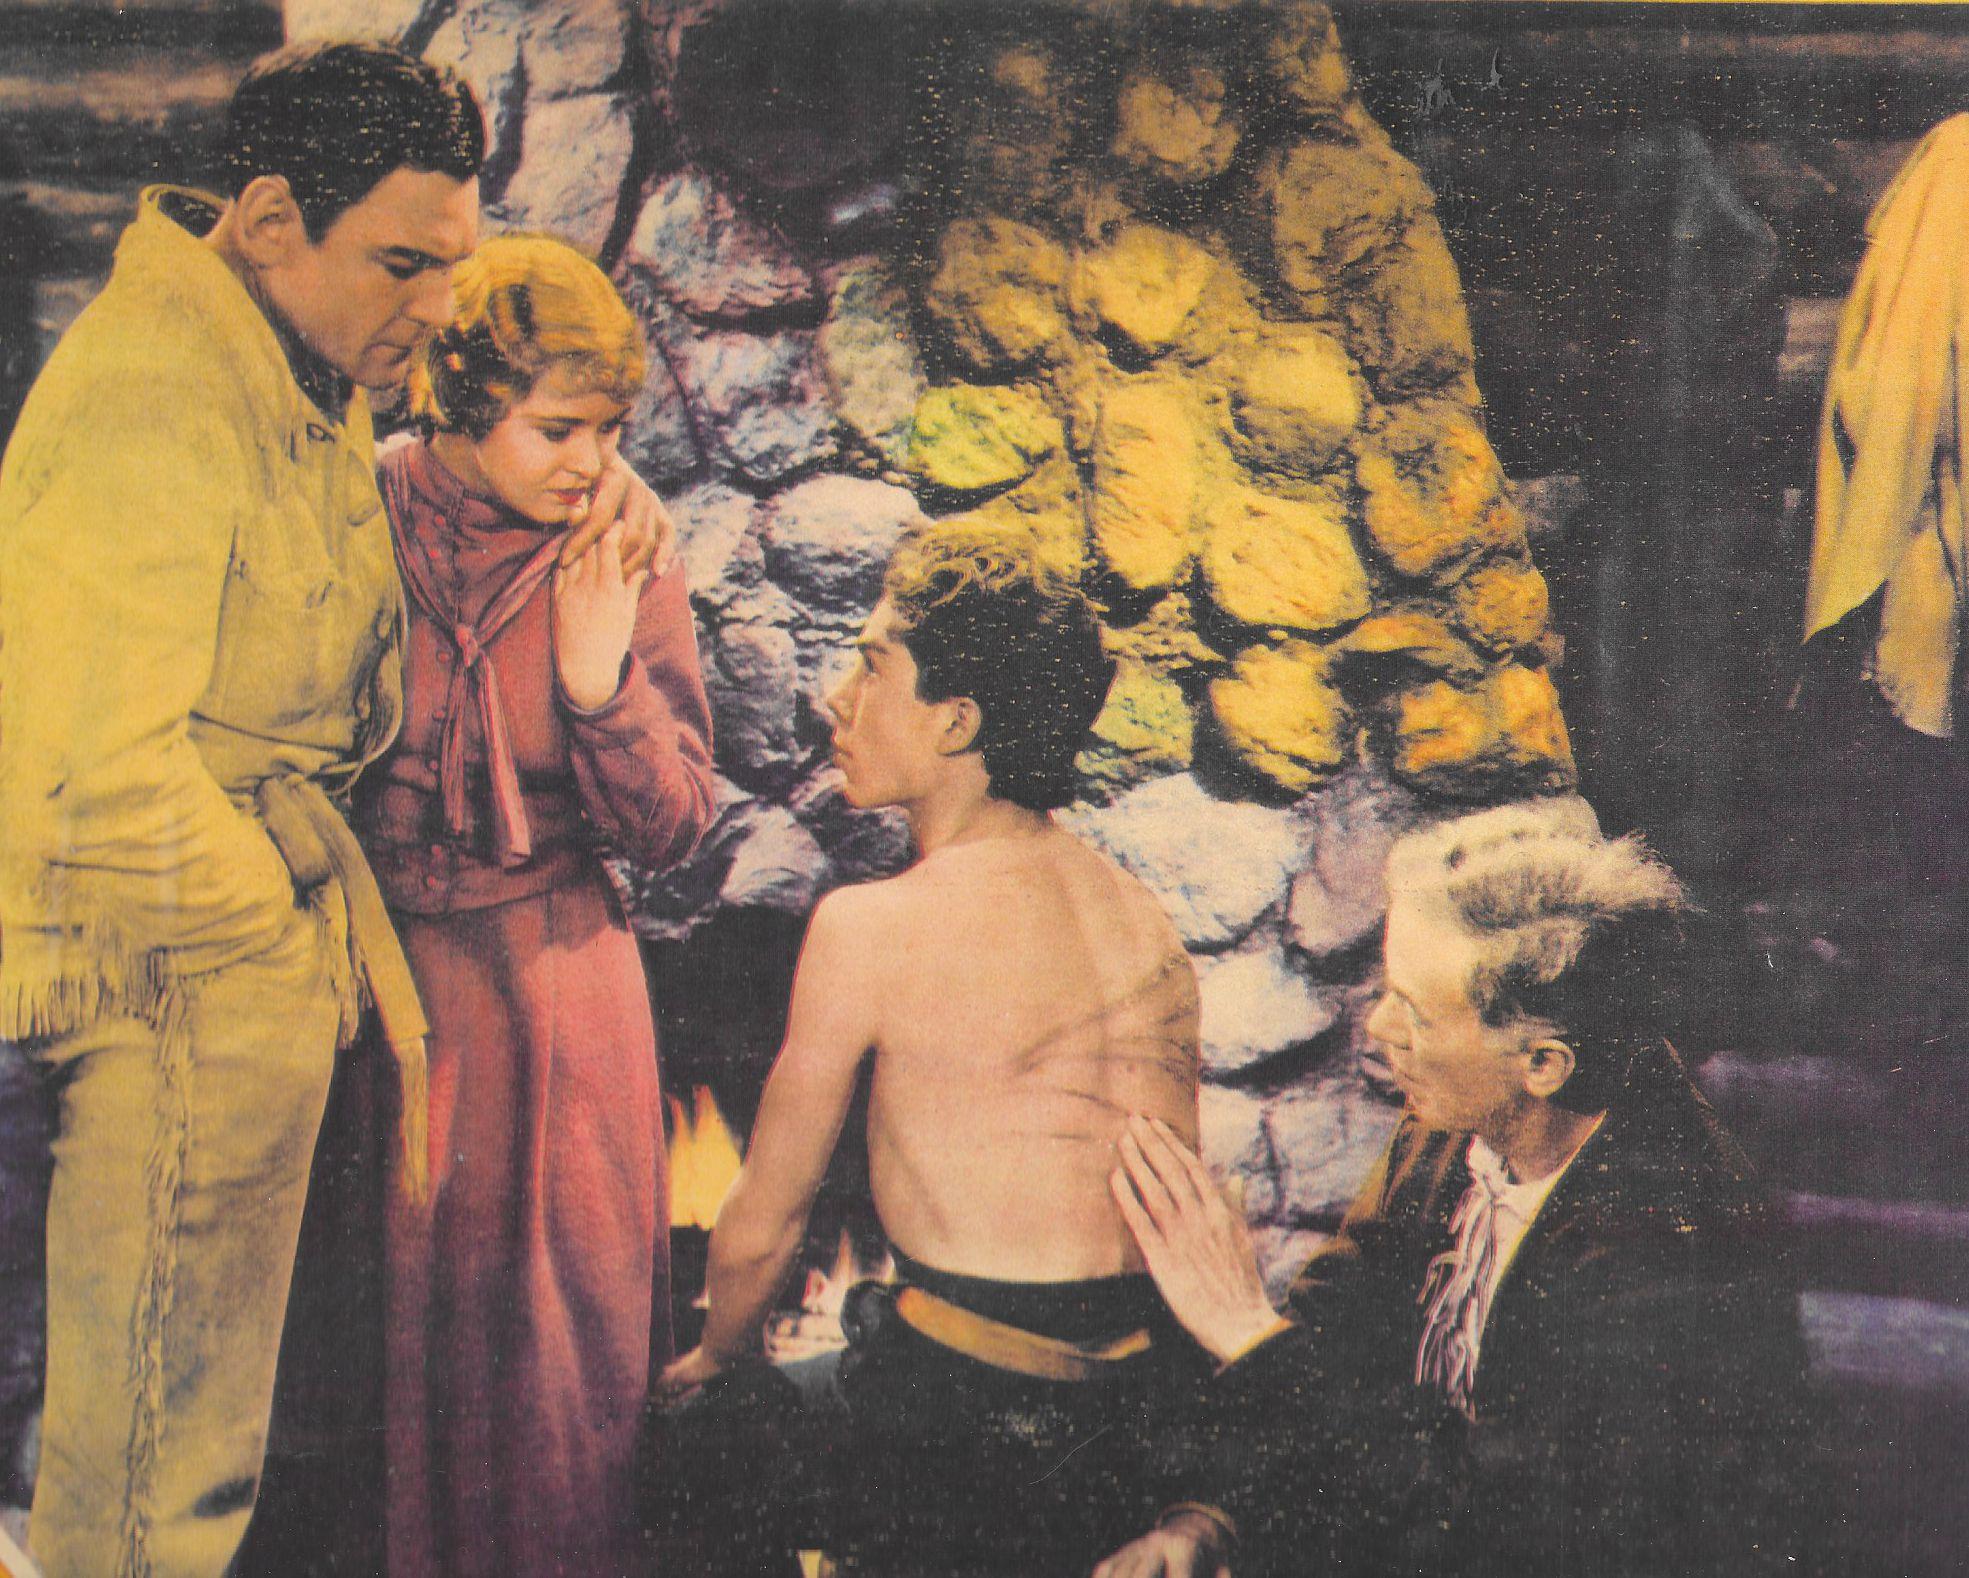 Buck Black, Buck Jones, Cecilia Parker, and Harry Todd in Unknown Valley (1933)